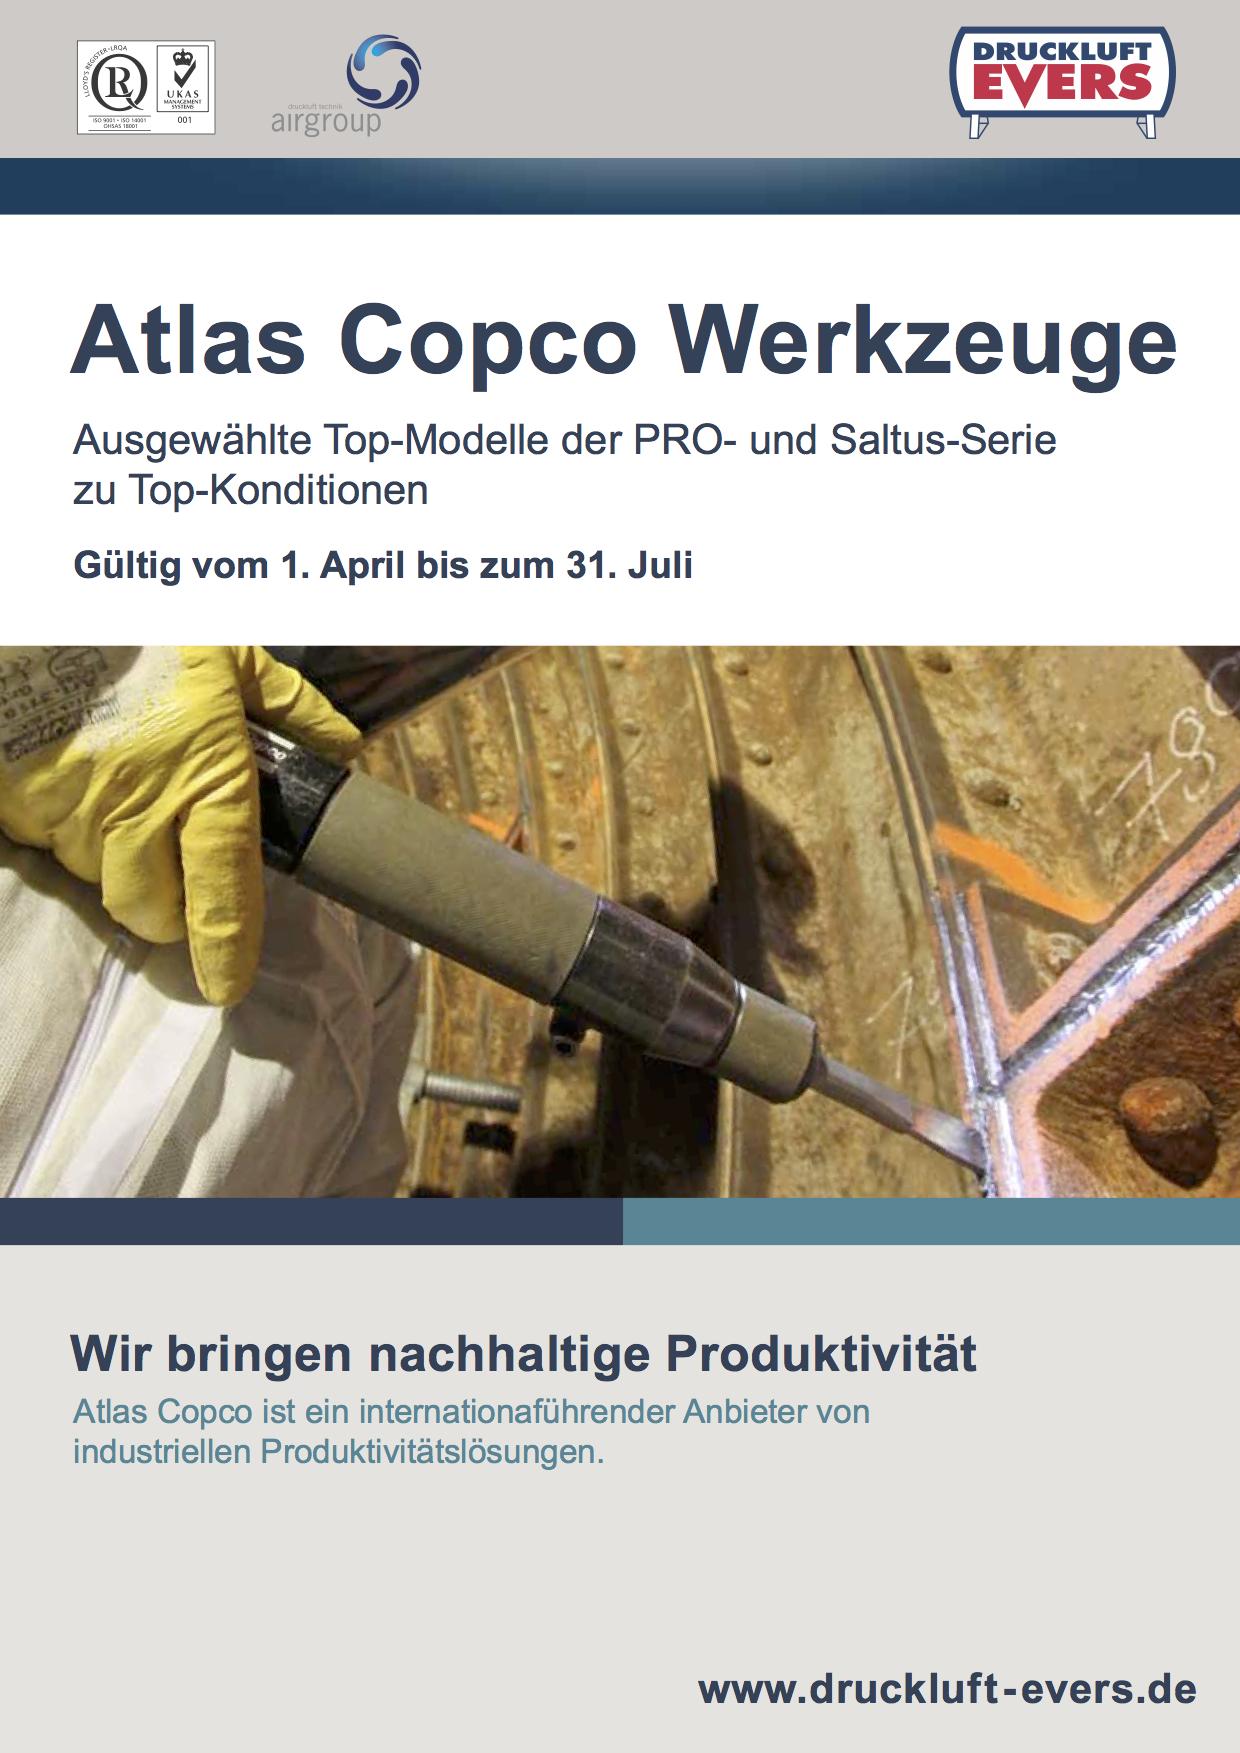 EVERS_AtlasCopco_Aktion_web